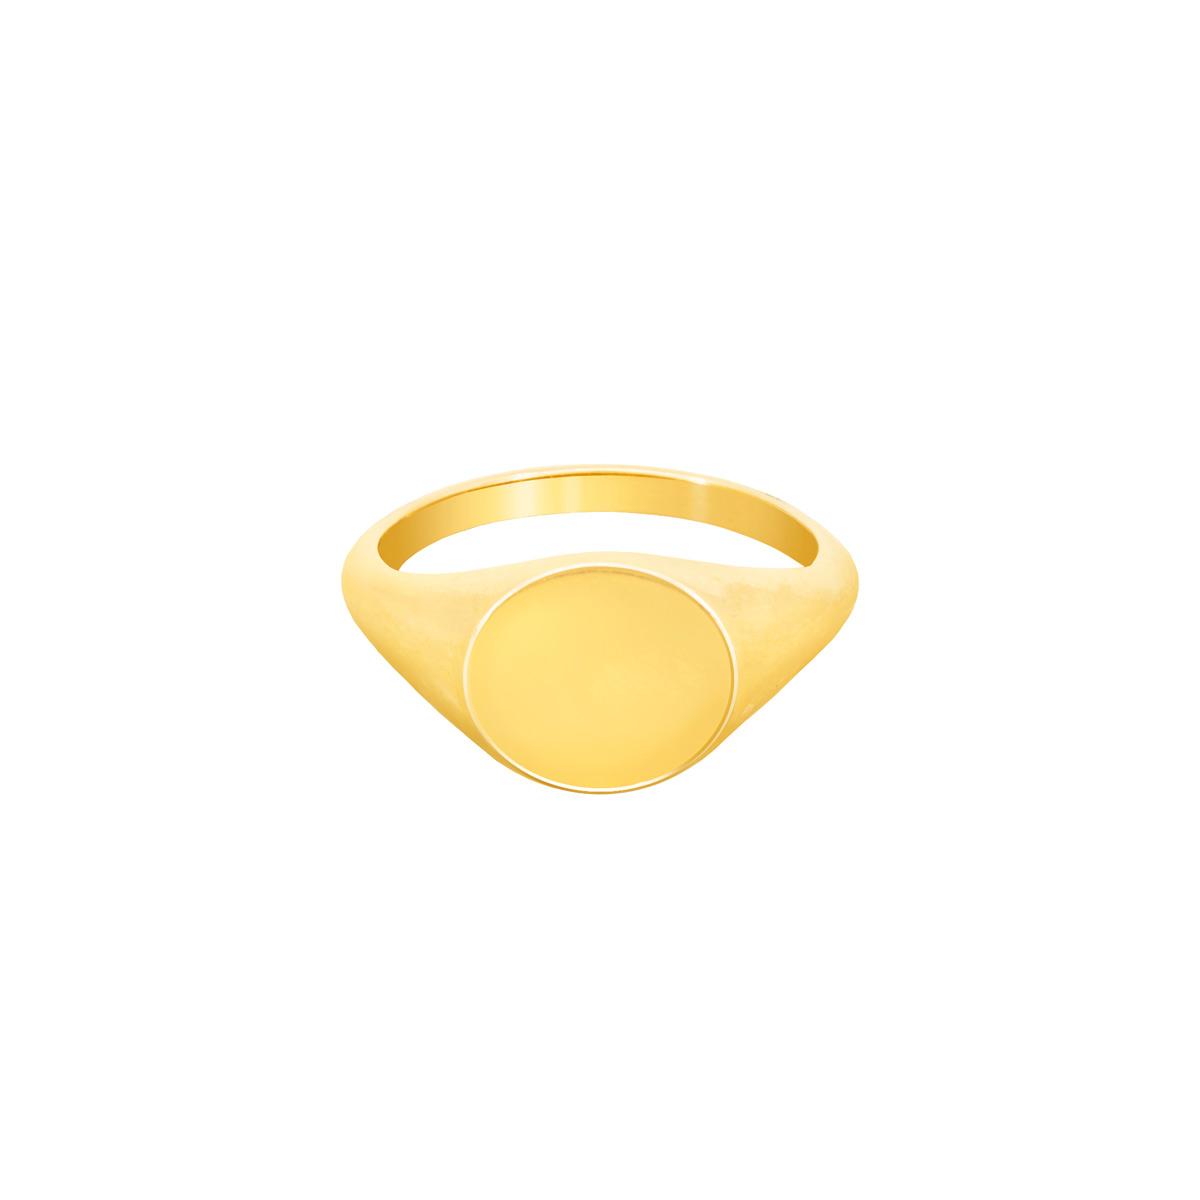 انگشتر طلا پینکی رینگ ساده پرسته